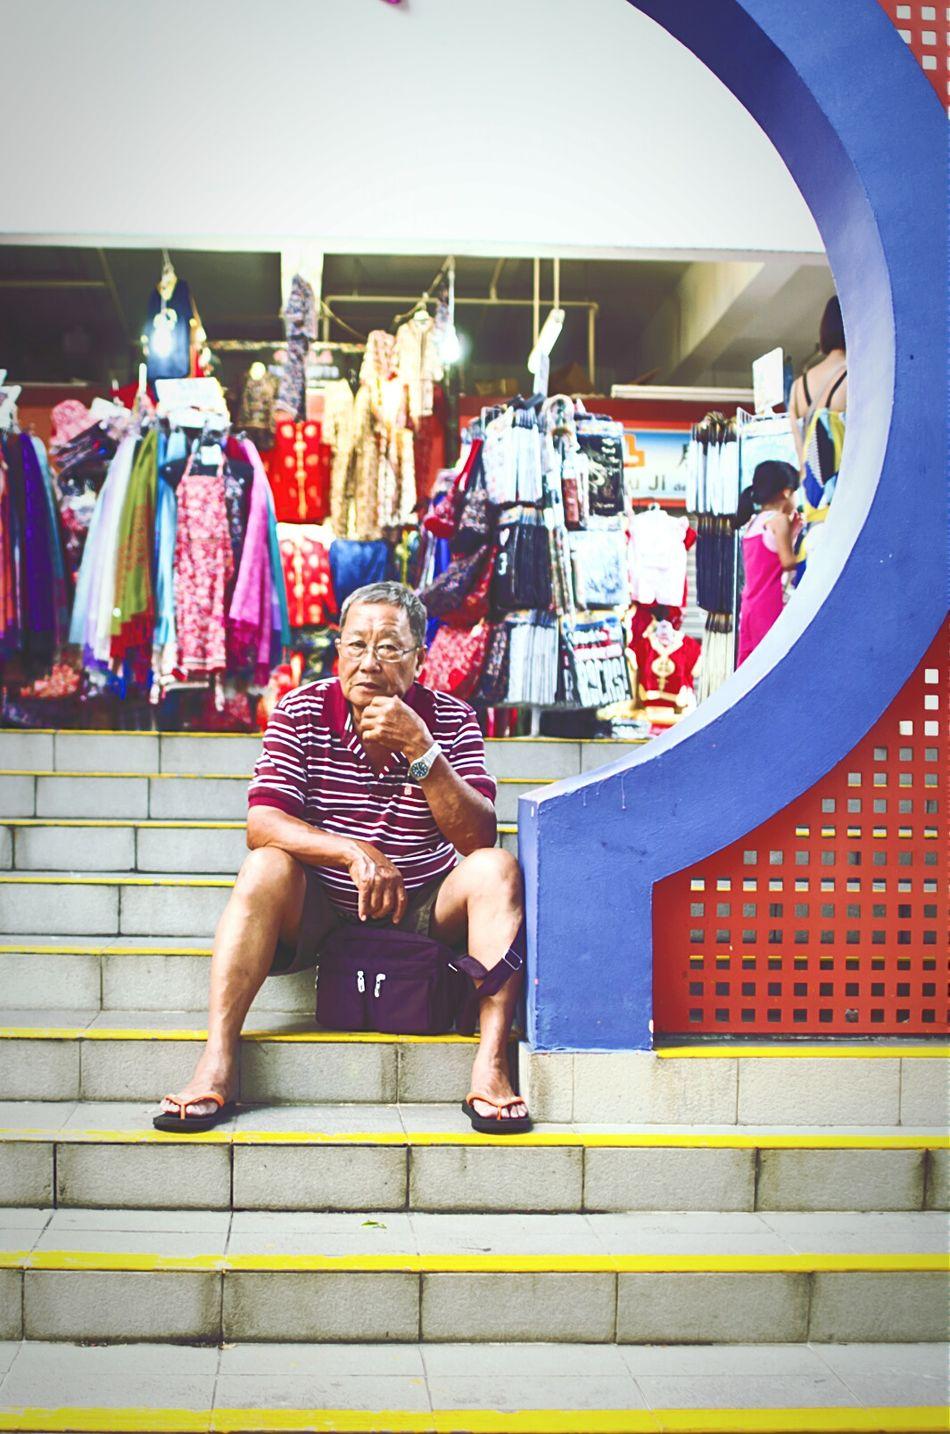 a question hangs over him EyeEm , EyeEmChinatownPhotowalk , Streetphotography , Moongate , Bystander , Market ,